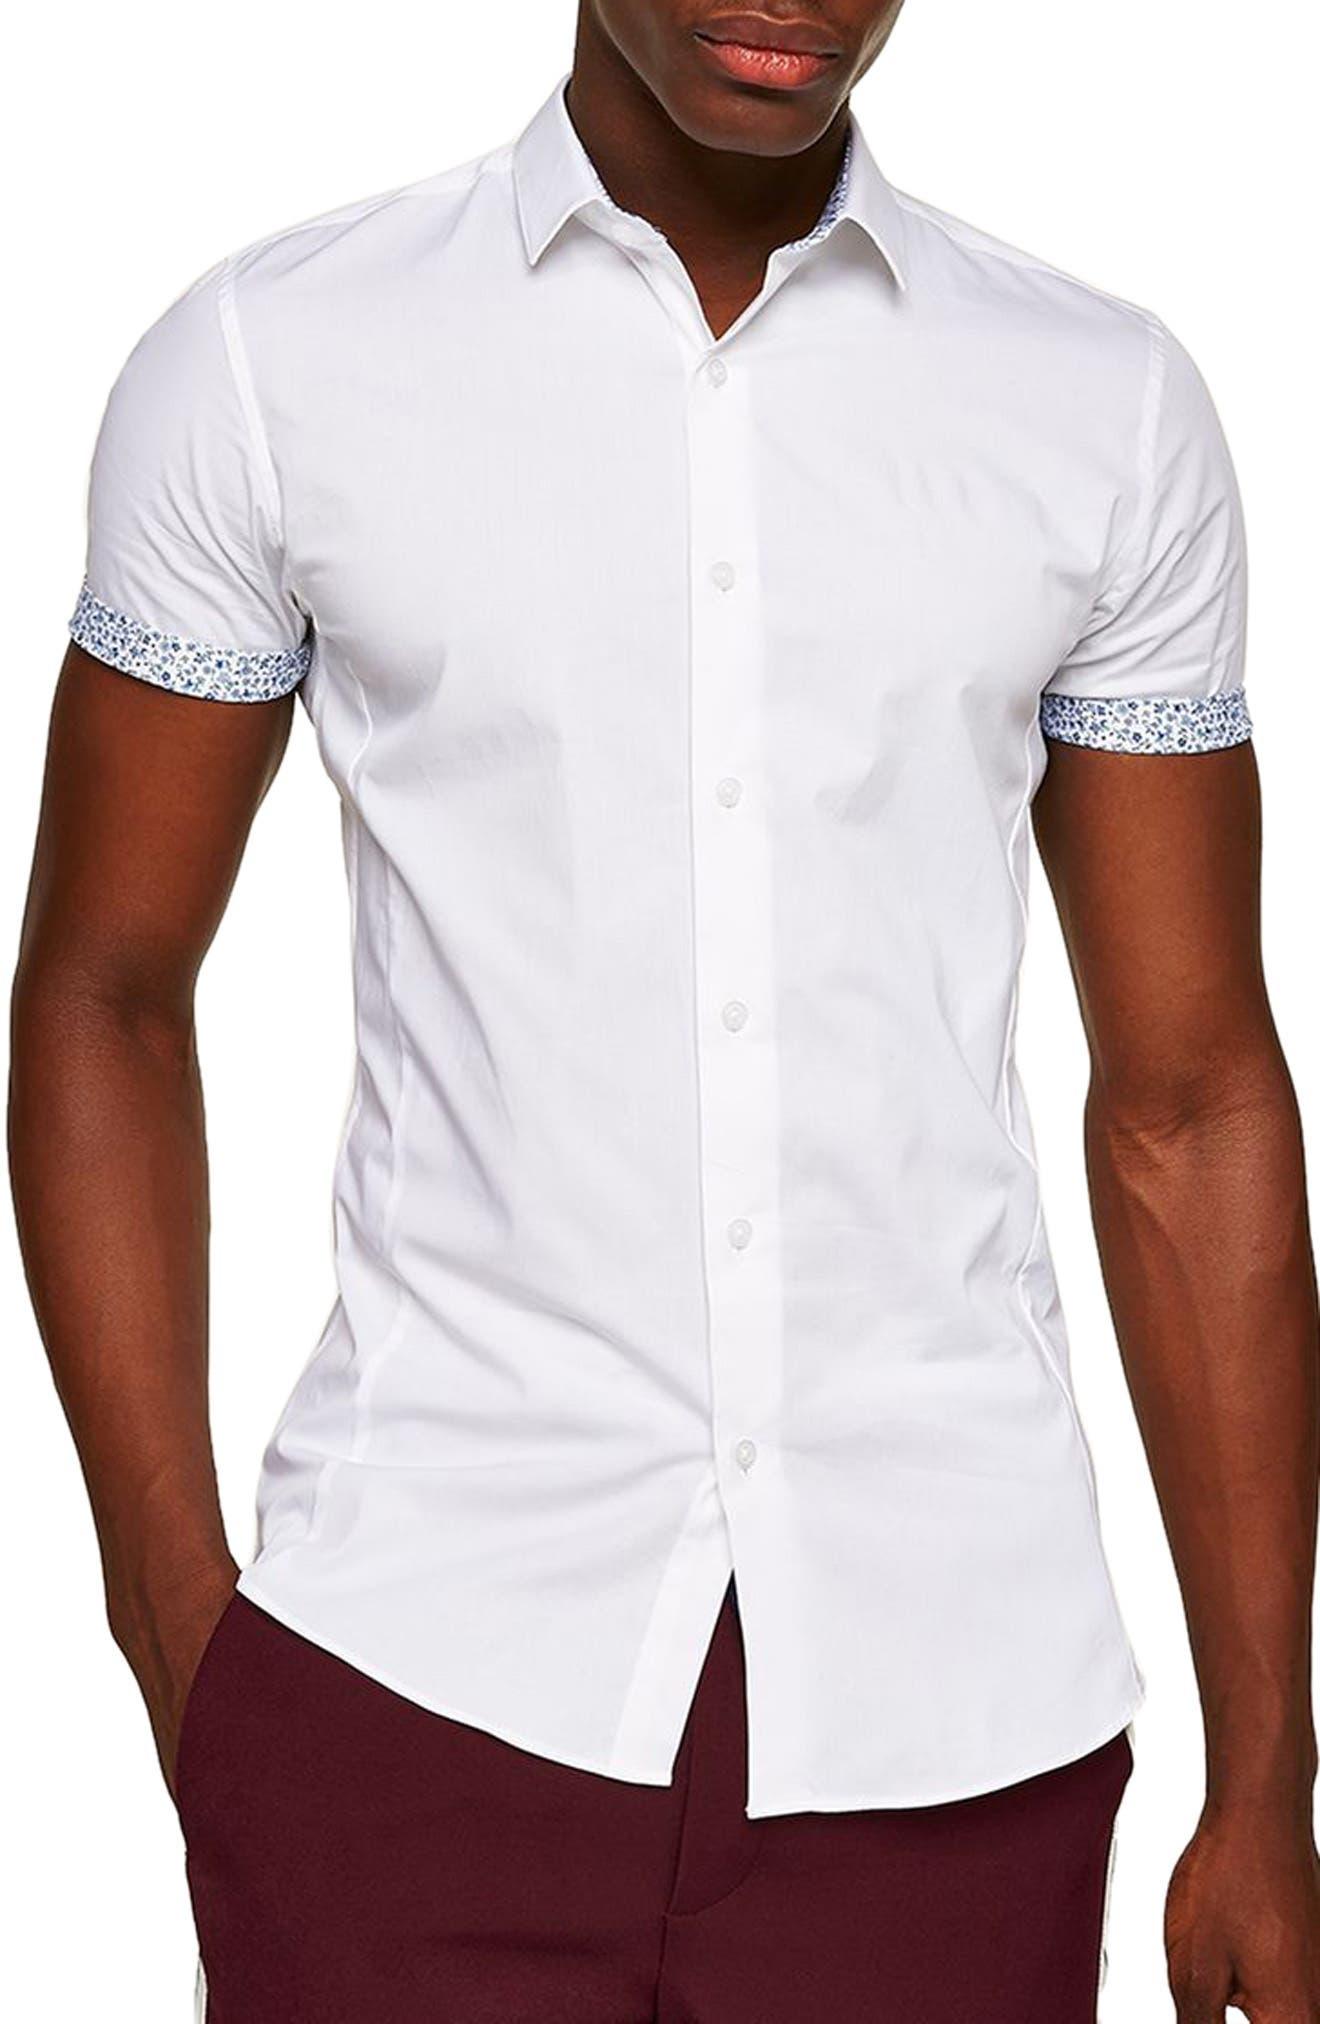 Muscle Fit Floral Trim Shirt,                         Main,                         color, White Multi